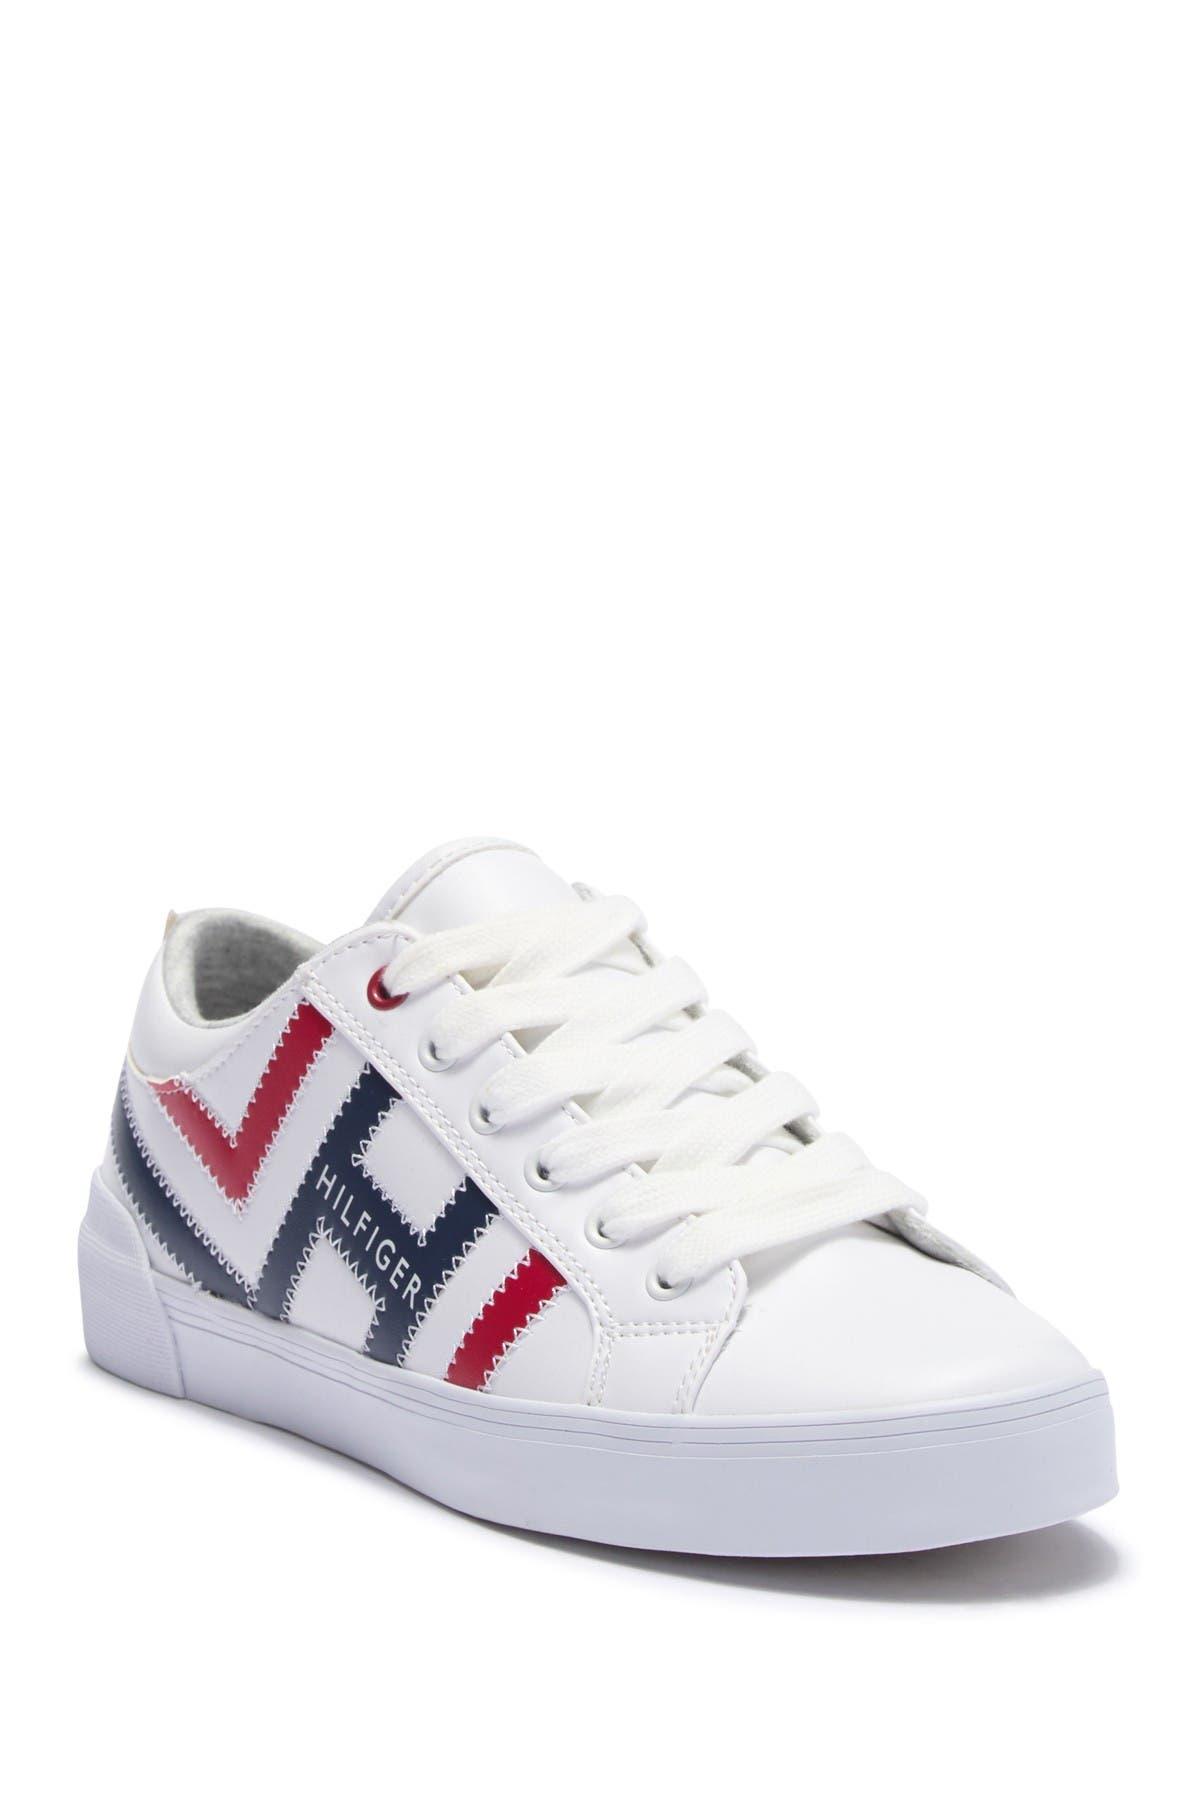 Tommy Hilfiger | Pema Sneaker